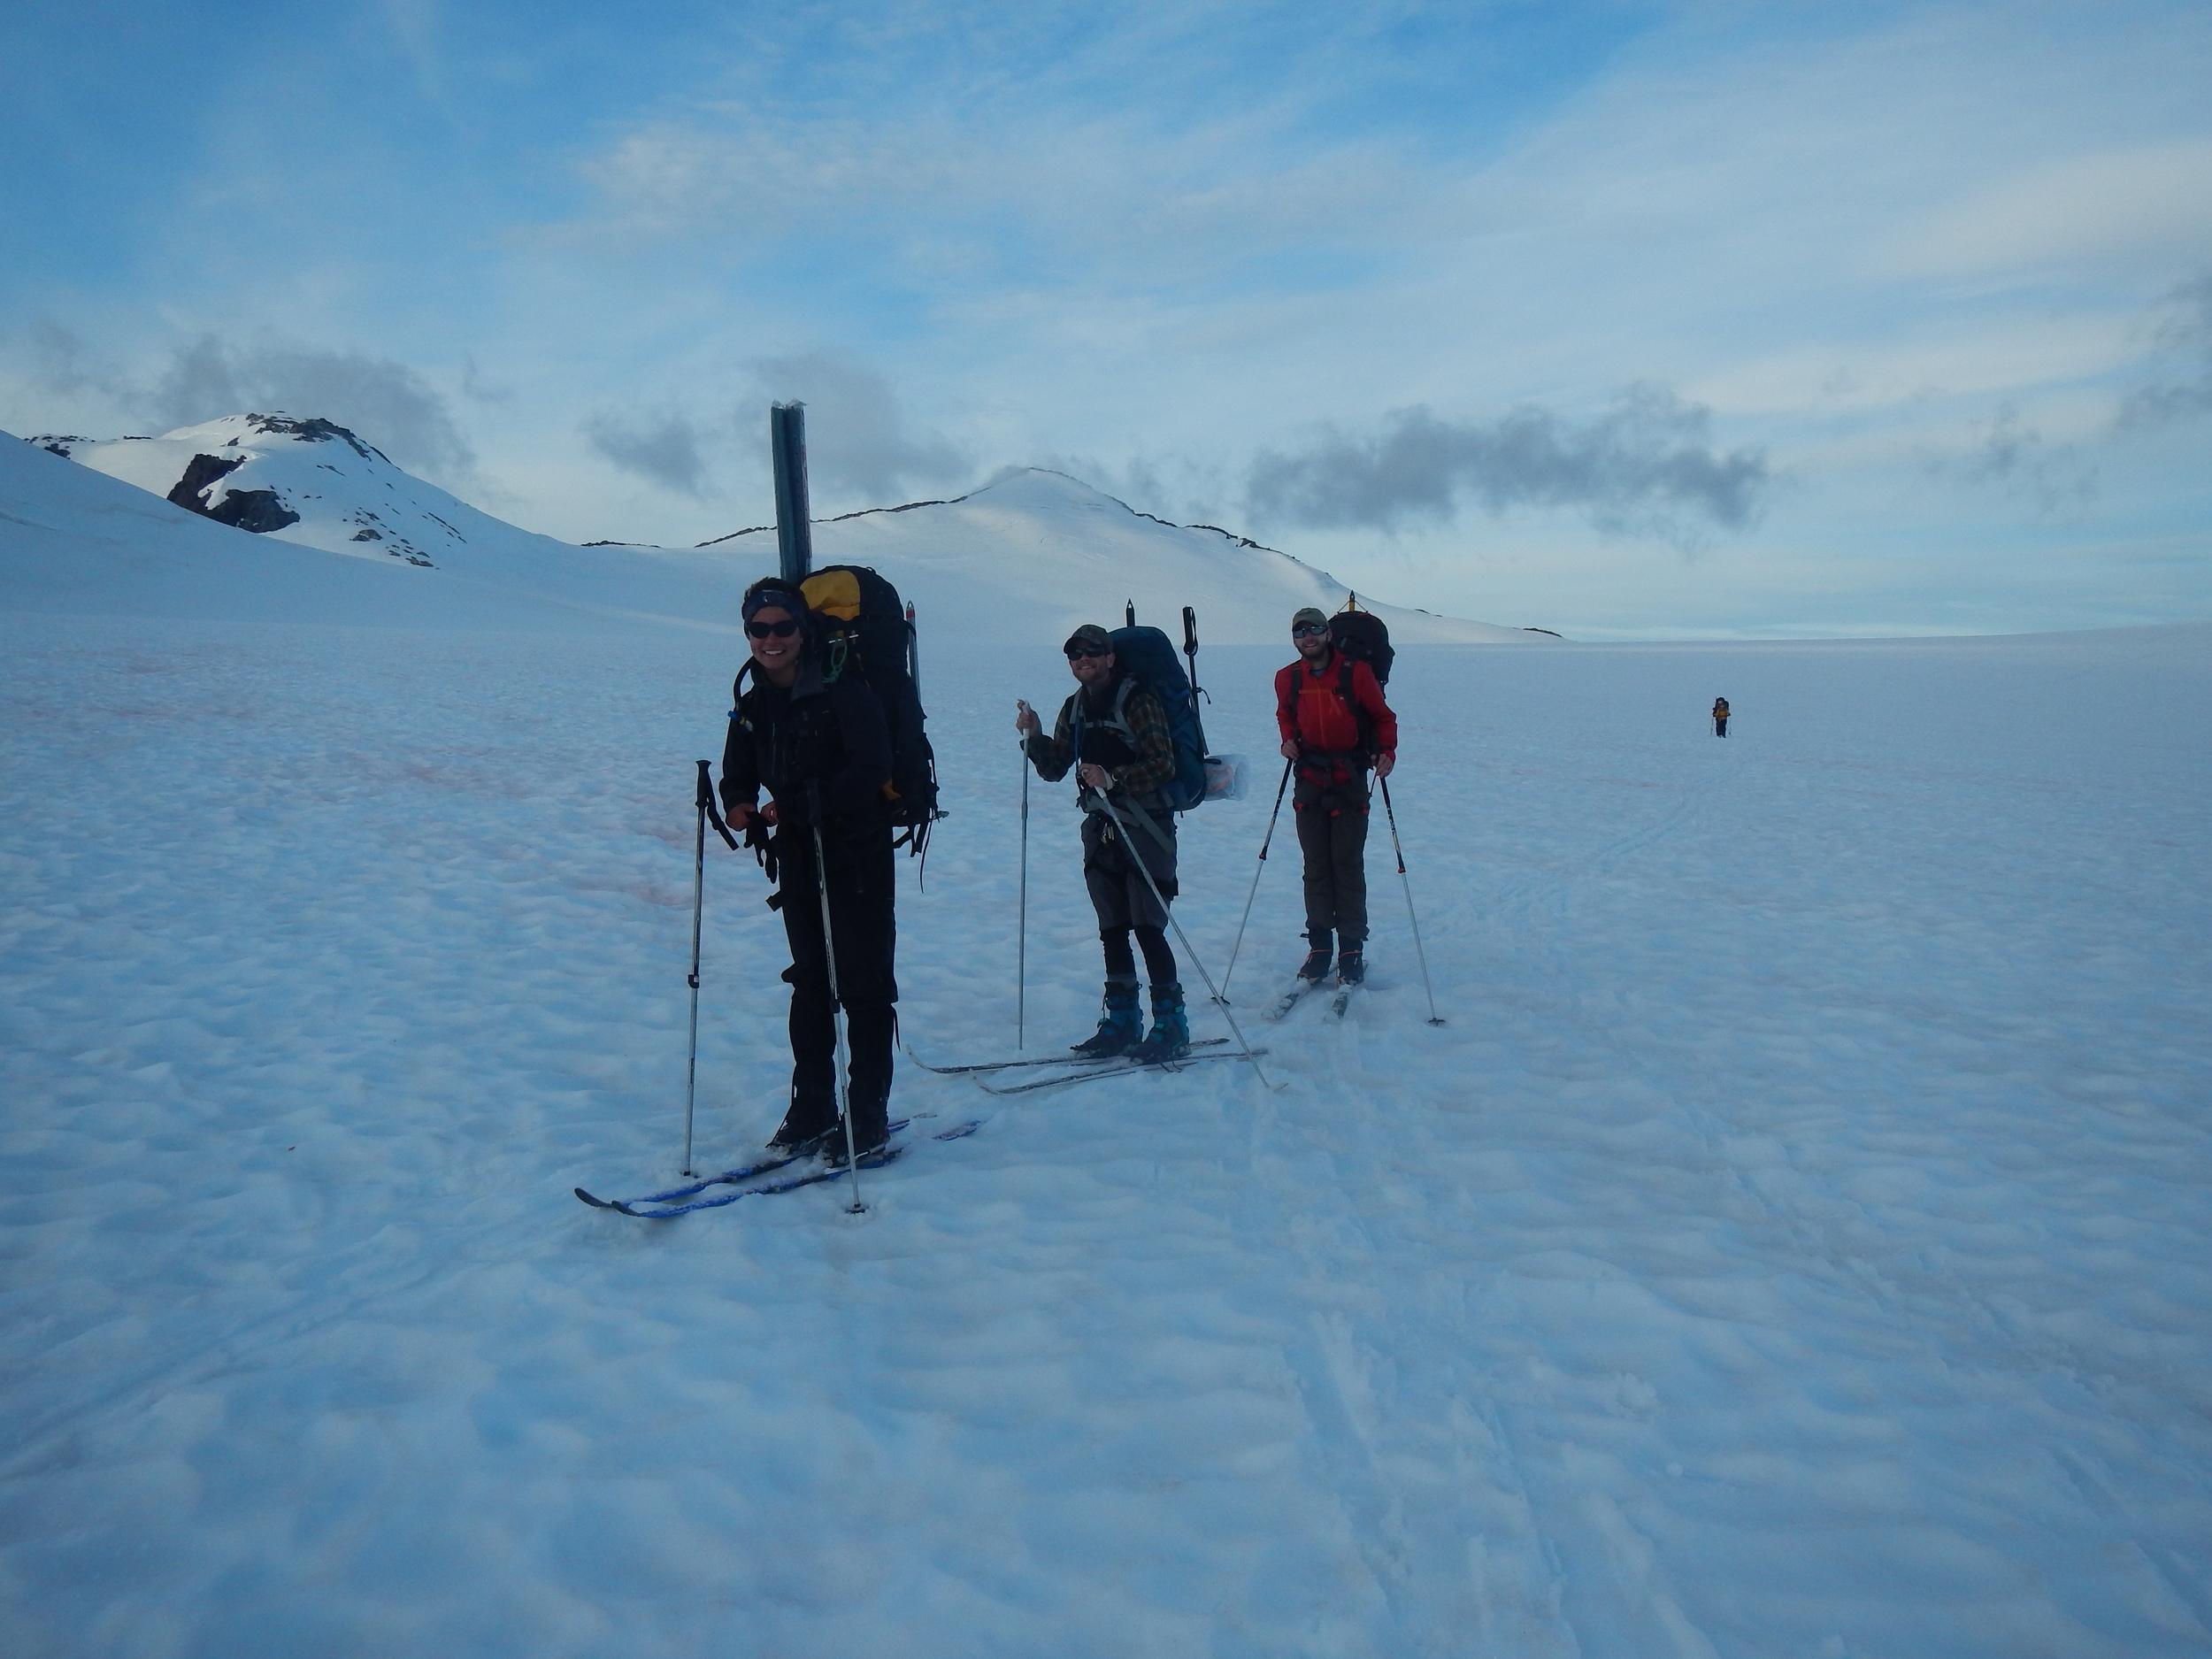 Kirsten, Elias, and Alex beginning the traverse. Photo by Elizabeth Kenny